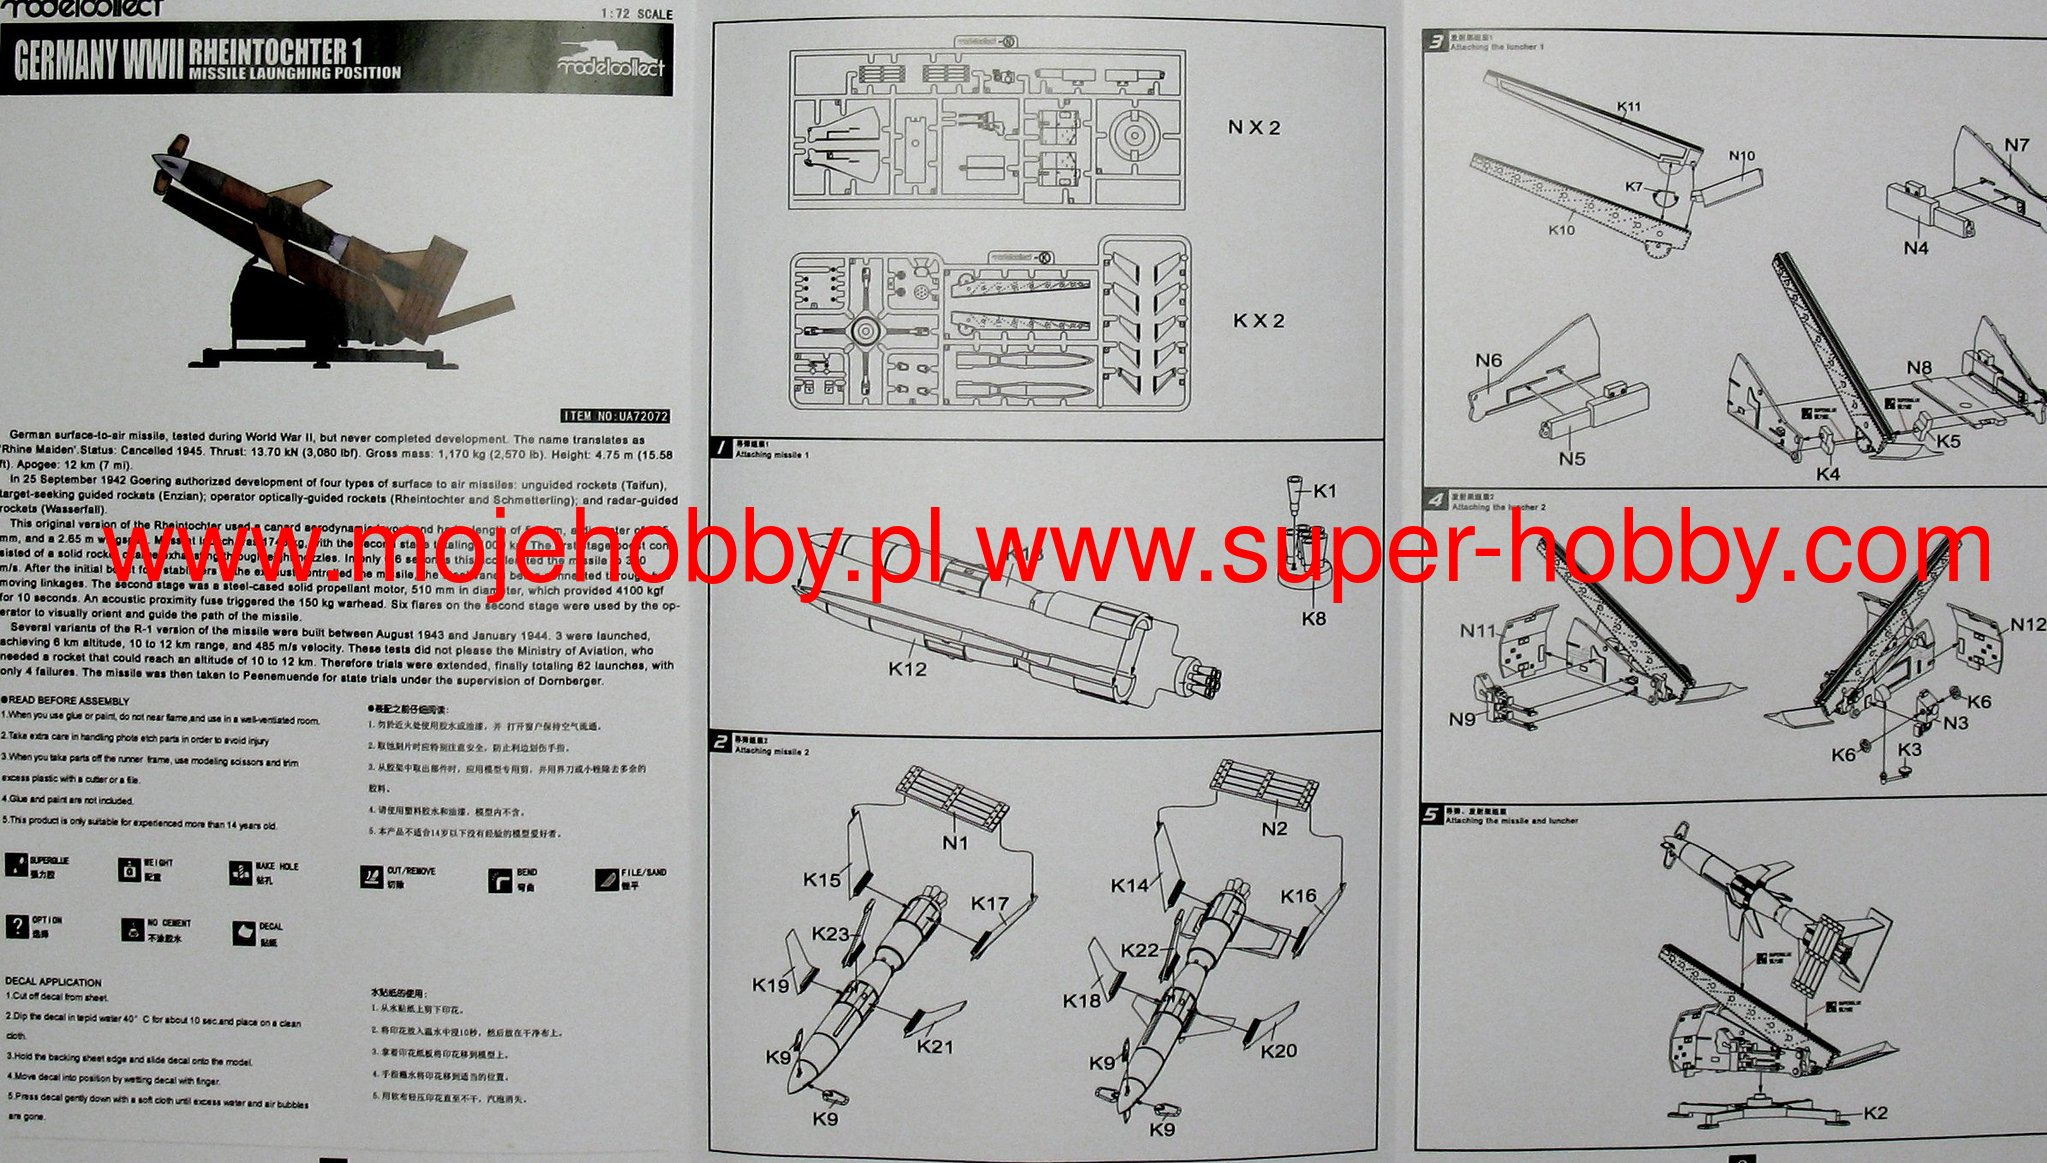 Rheintochter 1 missile Modelcollect UA72072 Ger